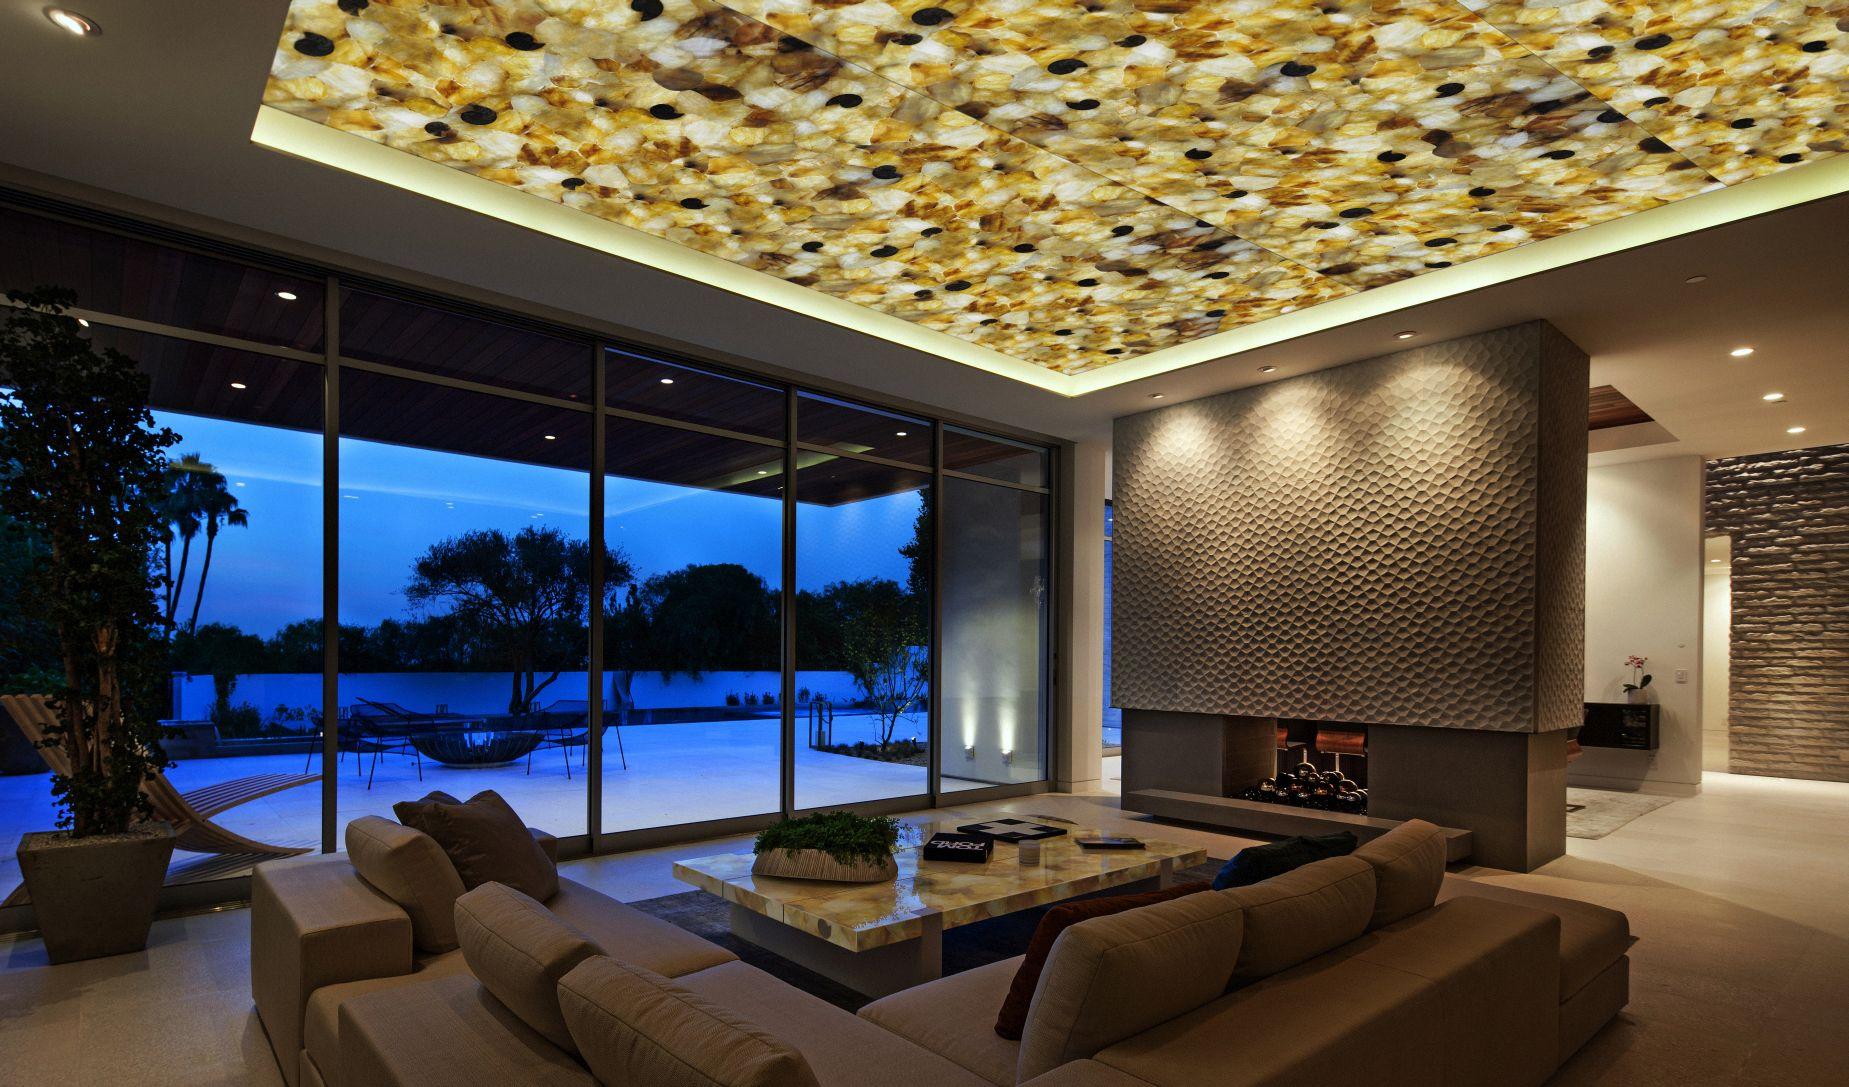 quartz yellow with amonites backlit ceiling